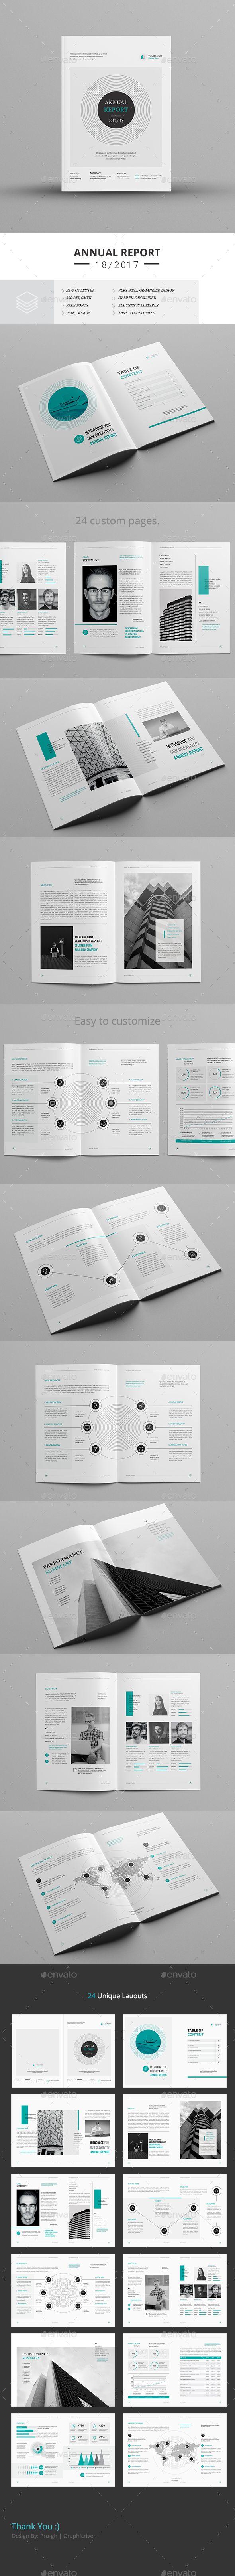 Annual Report A4 & Us Letter | Diseño de página